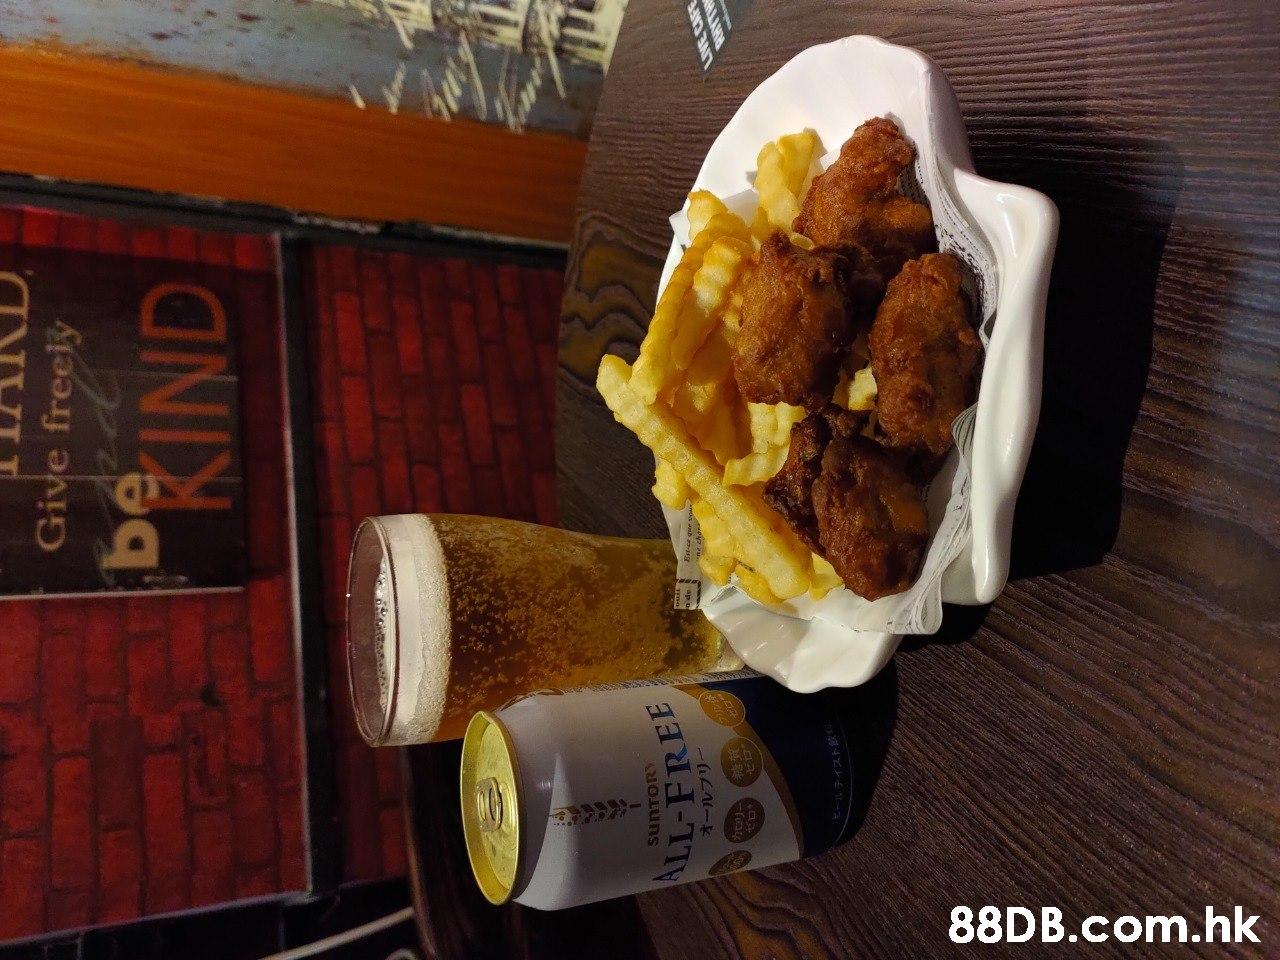 .hk Give freely RIND ALL-FREE オールプリー LIVE CAFE -riae MLAHH ールテイスト飲  Dish,Food,Fast food,Junk food,Cuisine